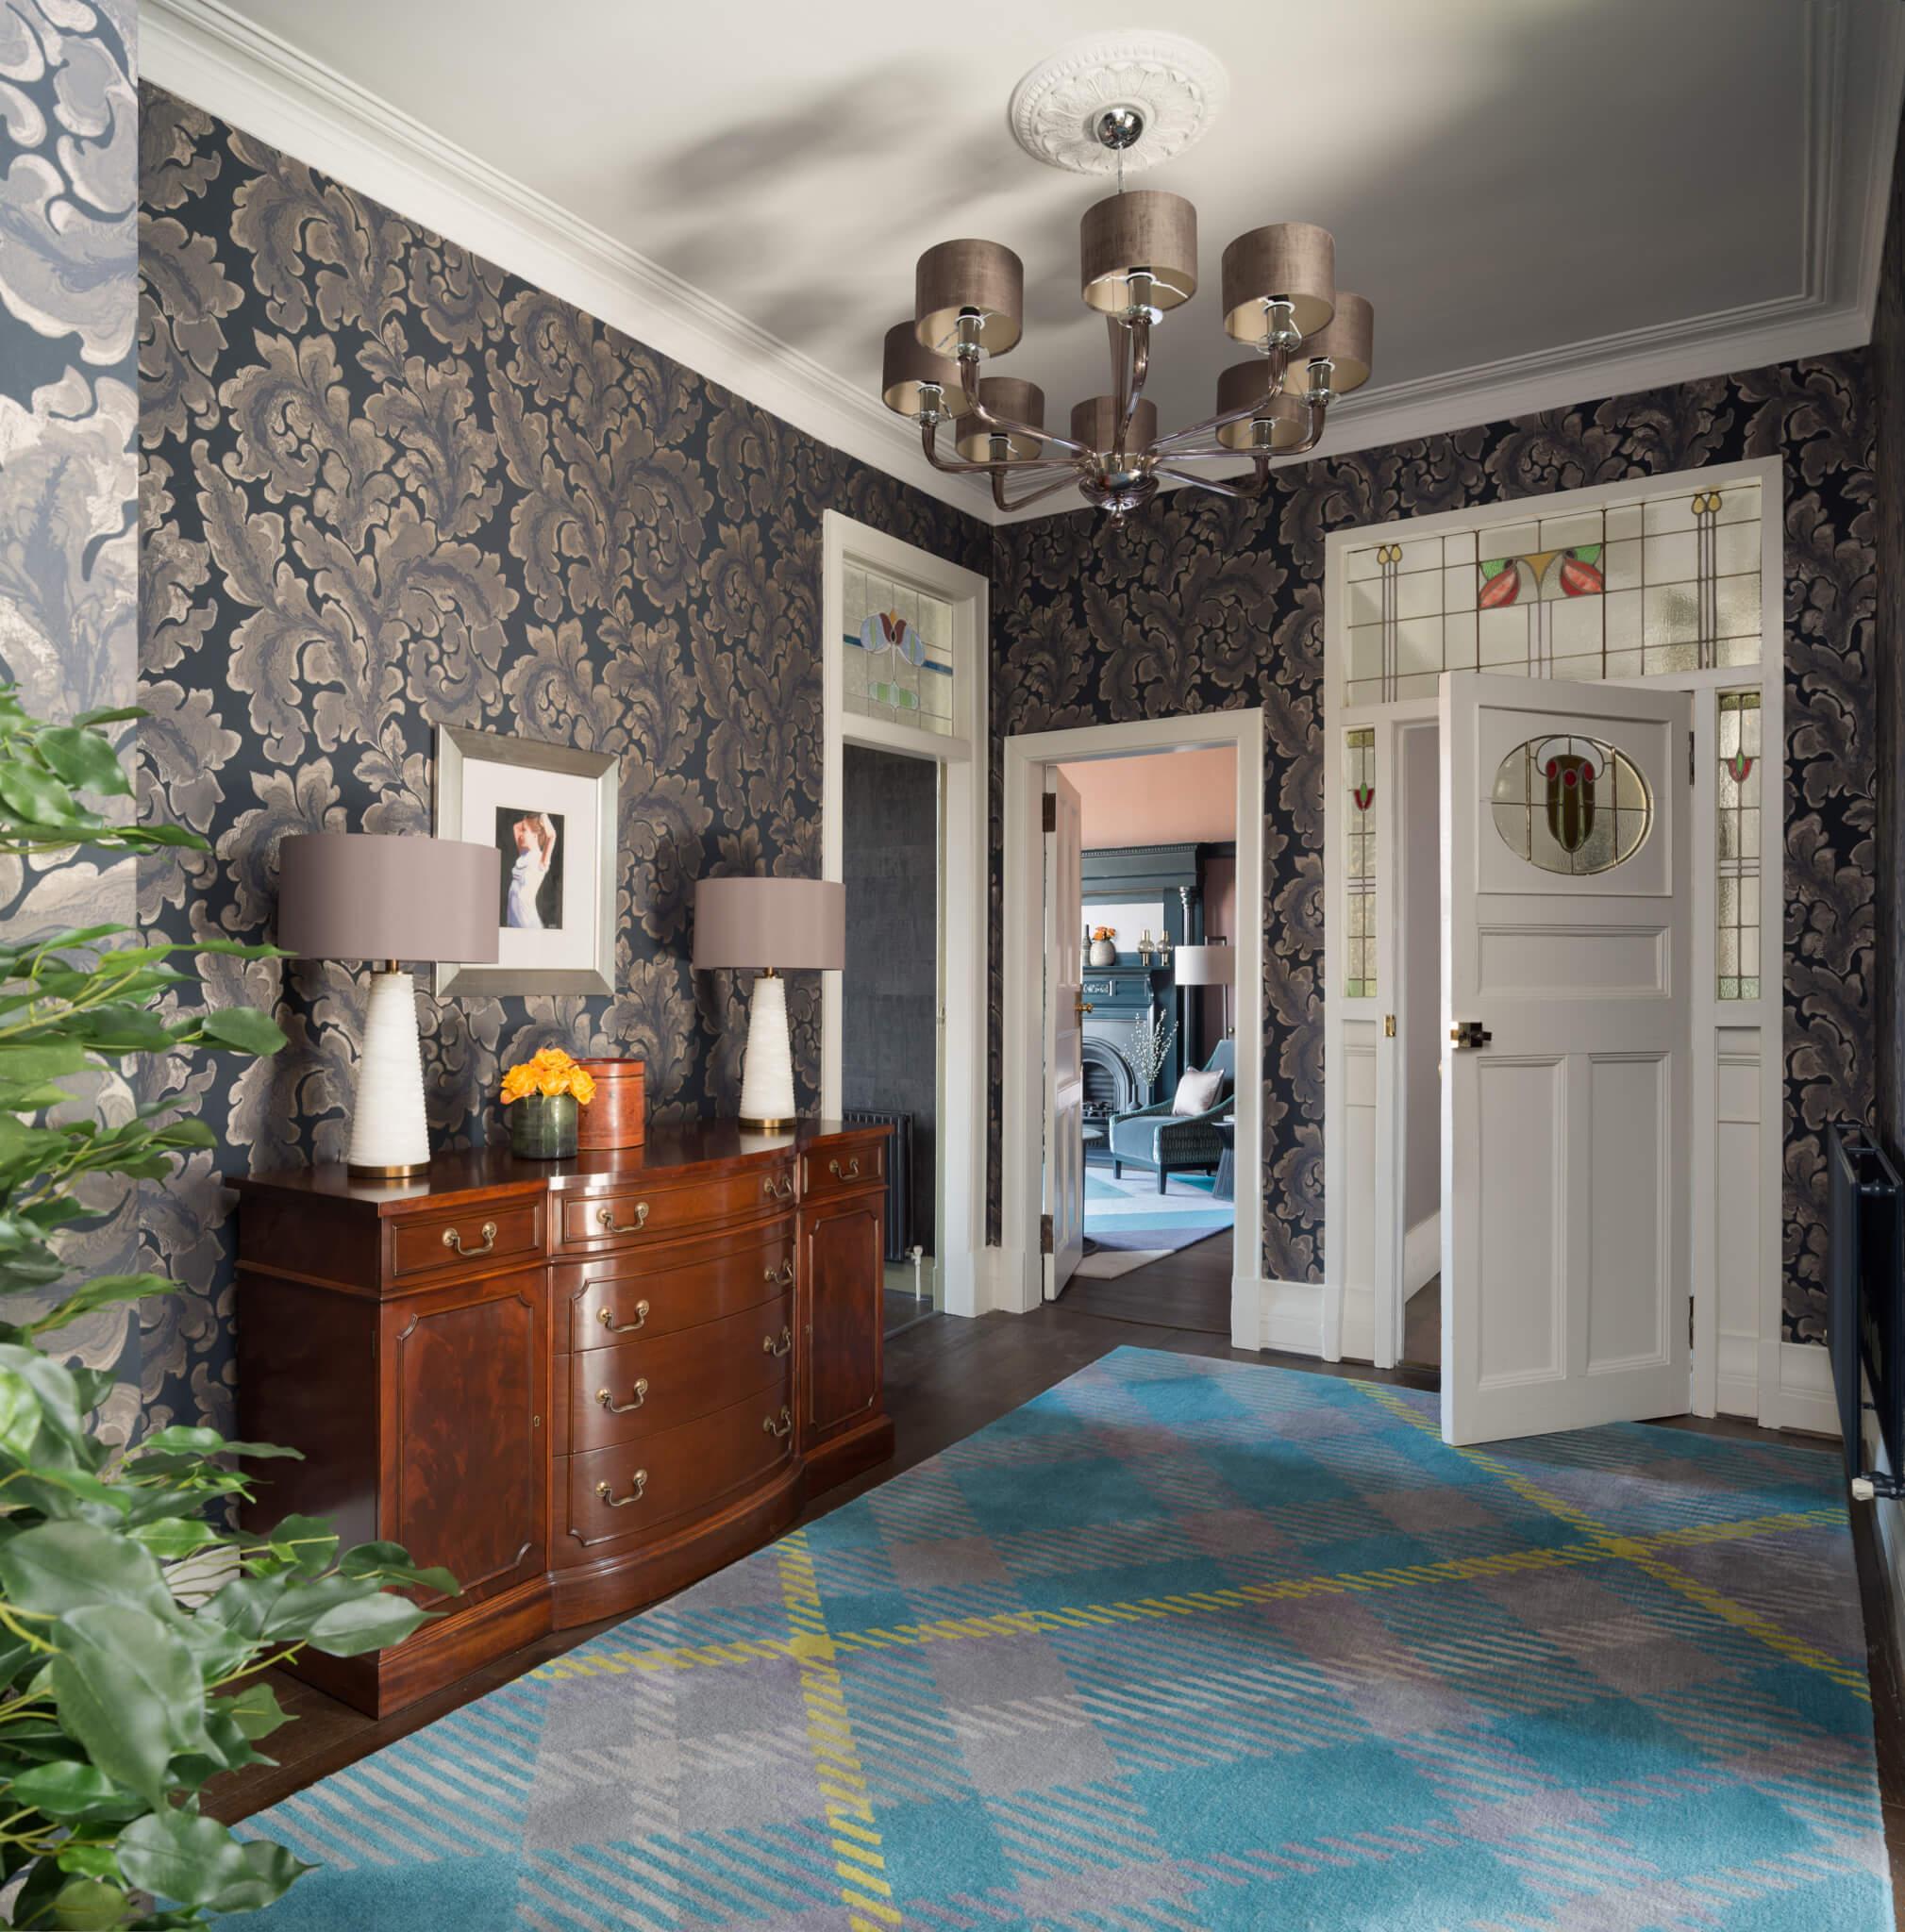 Print-Hall-to-Entrance-Door-Chelsea-Mclaine-Interiors-Introductory-Shoot-©ZACandZAC